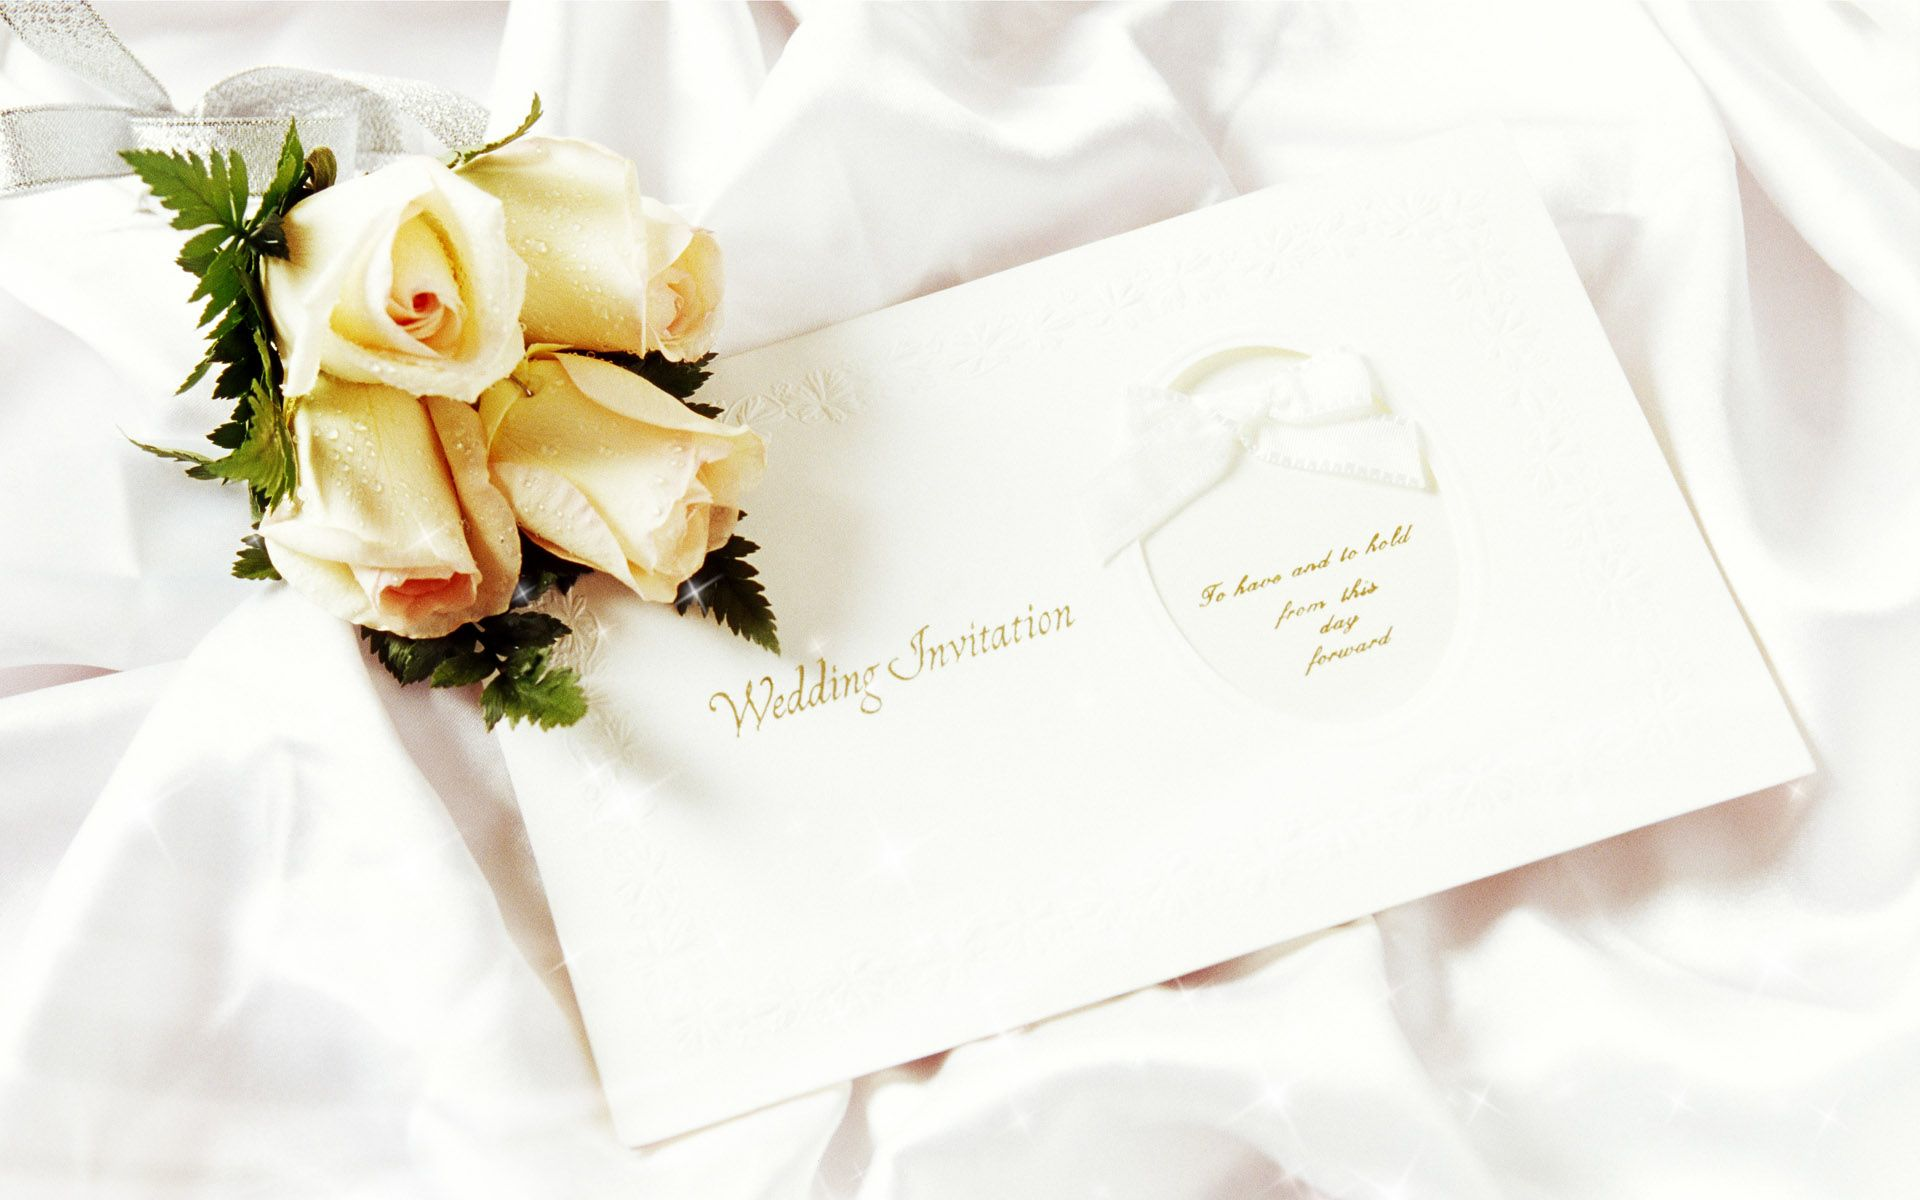 Fantastic Wallpaper High Resolution Wedding - 74a5ff48d800cd765990c9bf3cd4ce97  Picture_778914.jpg